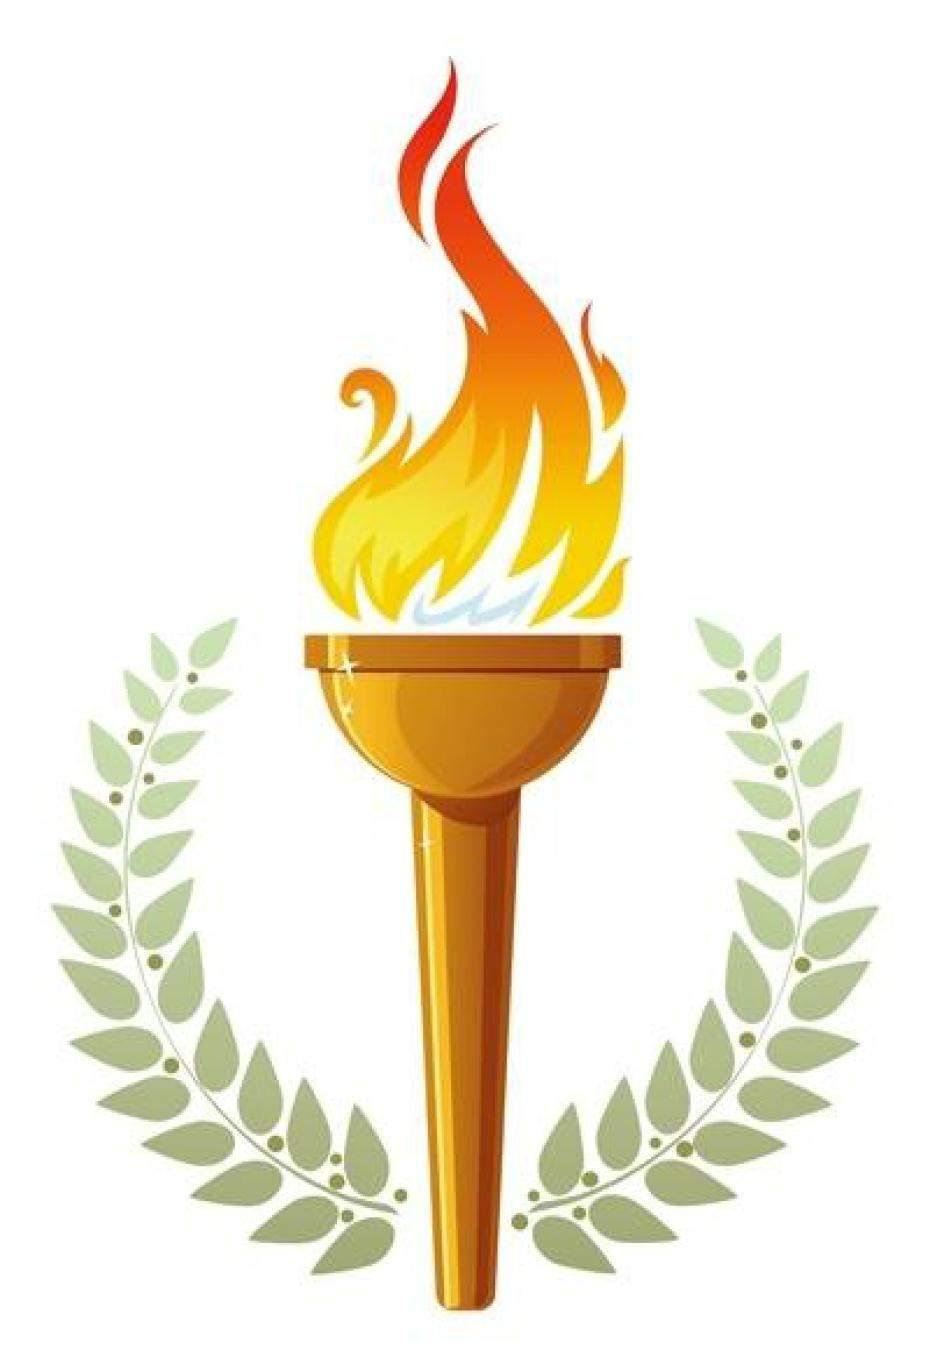 Actualit olympiades u15 28 ao t 2014 club football - Flamme olympique dessin ...